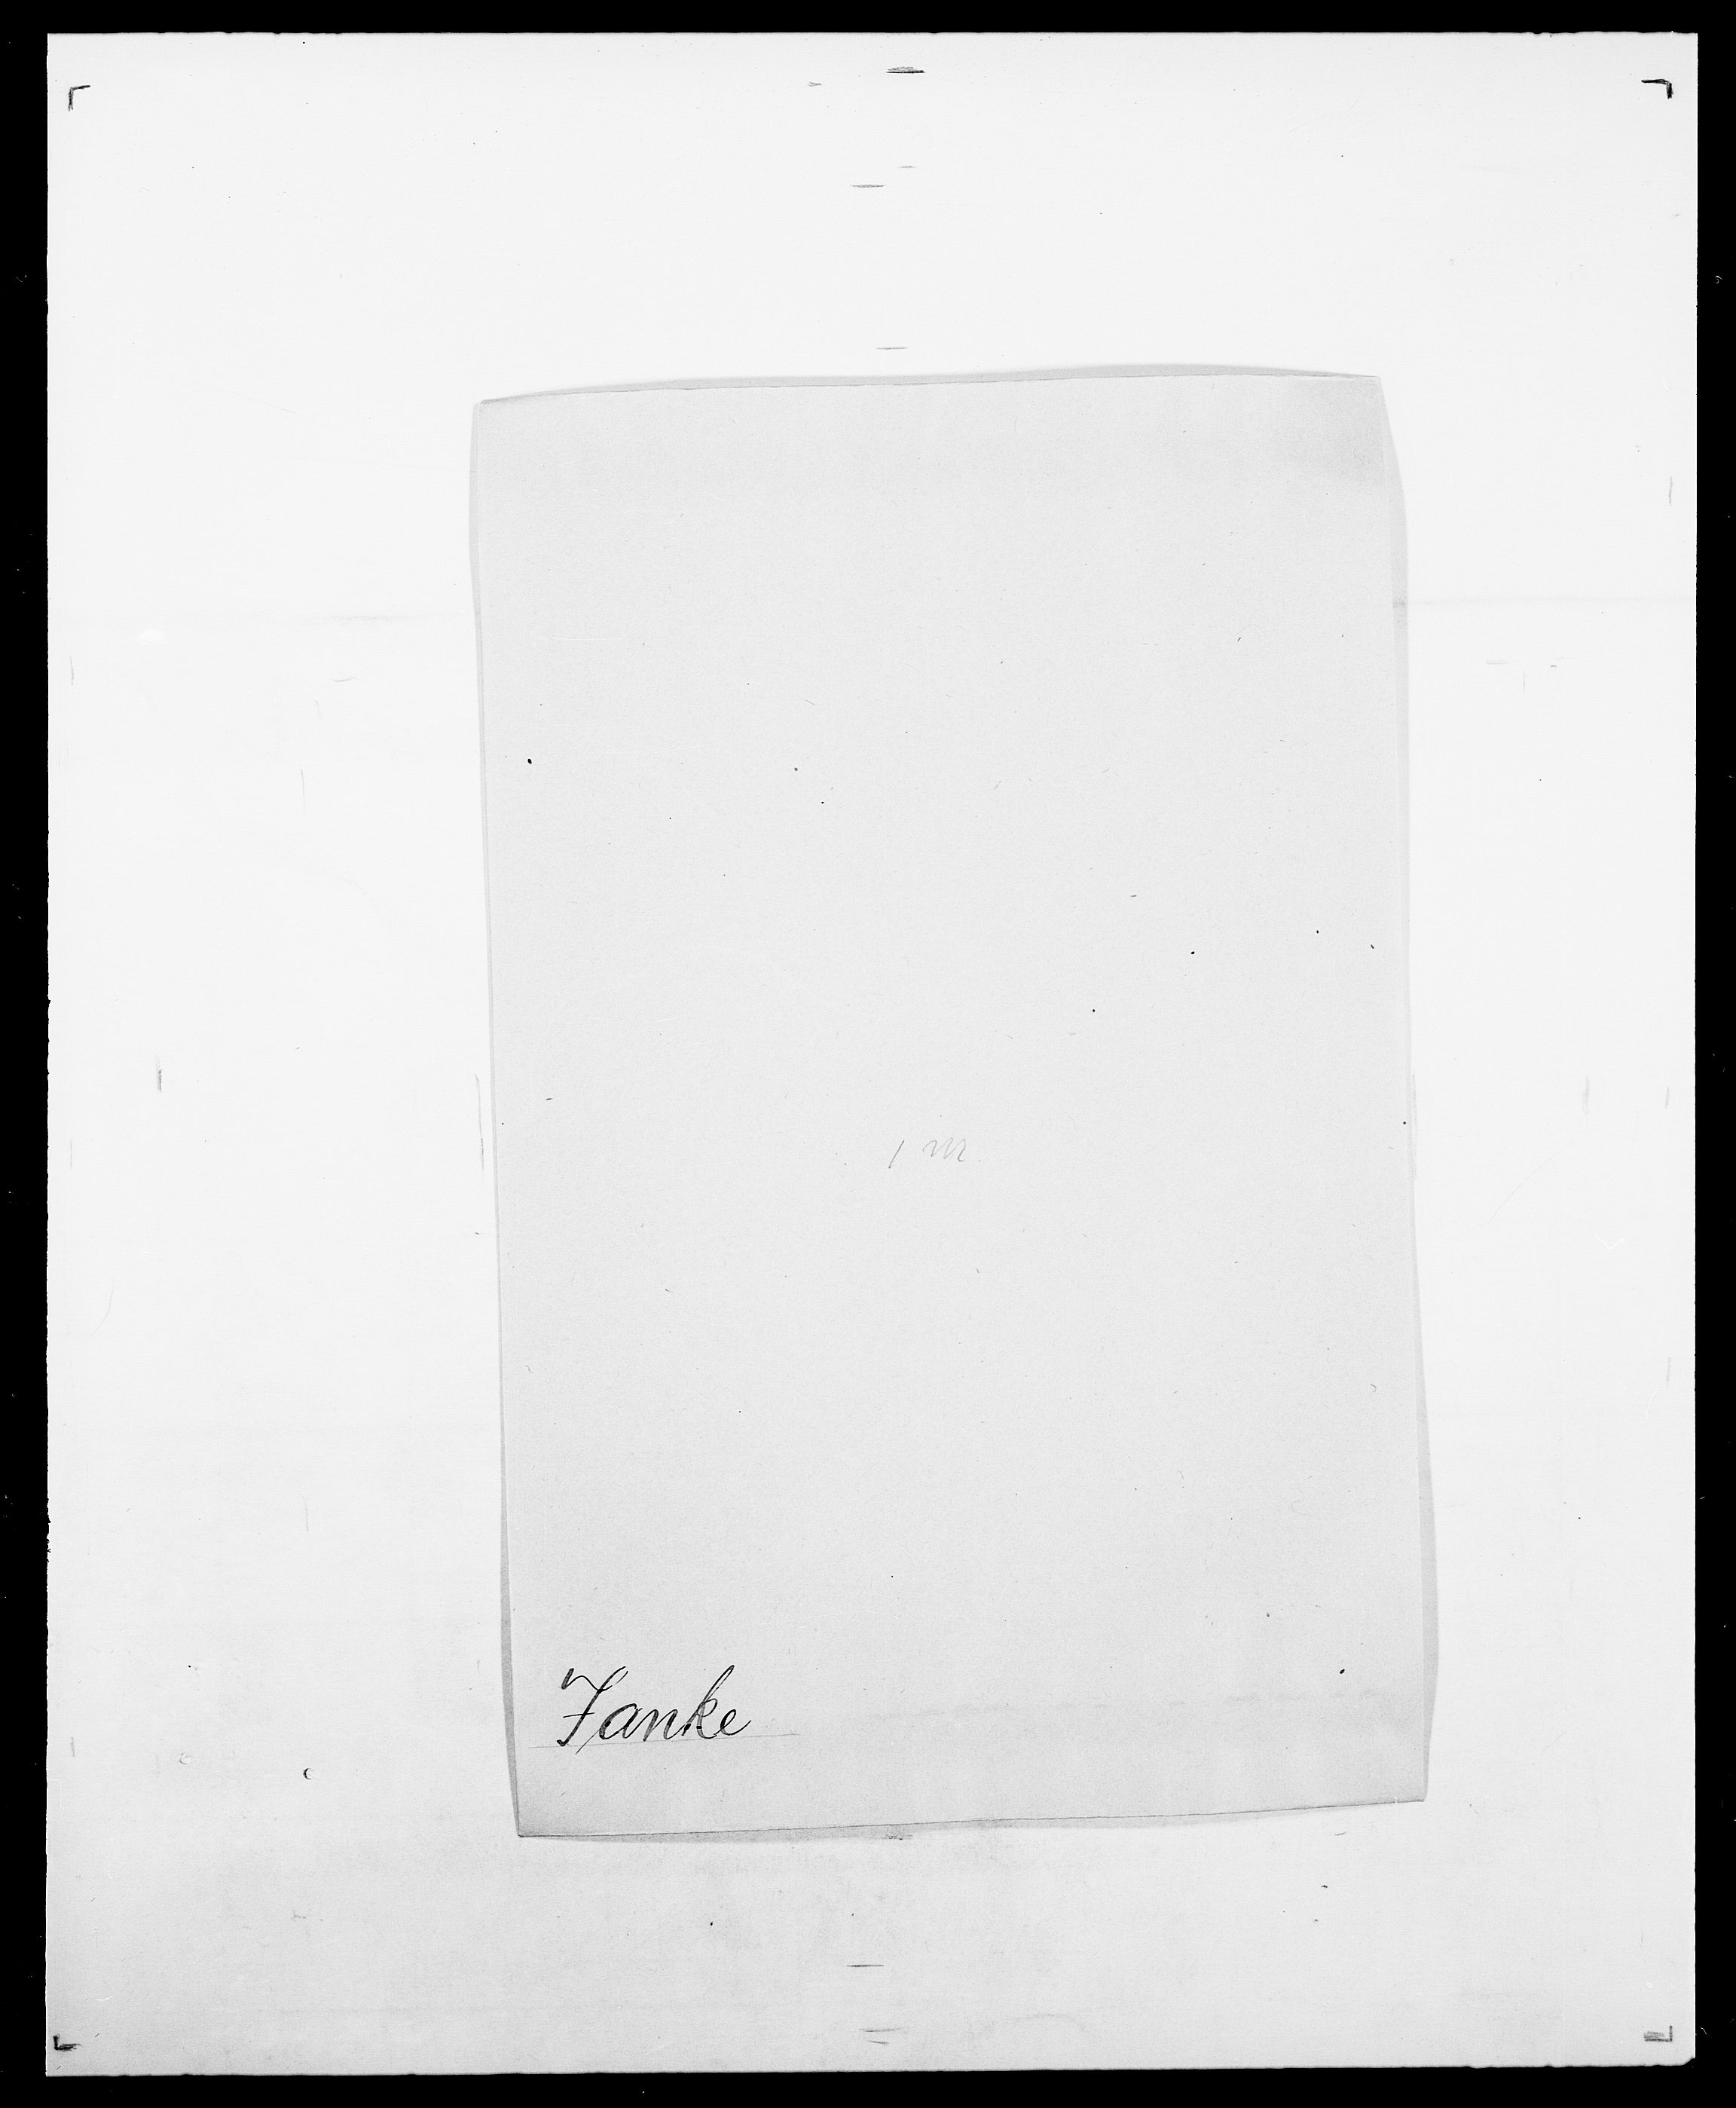 SAO, Delgobe, Charles Antoine - samling, D/Da/L0019: van der Hude - Joys, s. 540